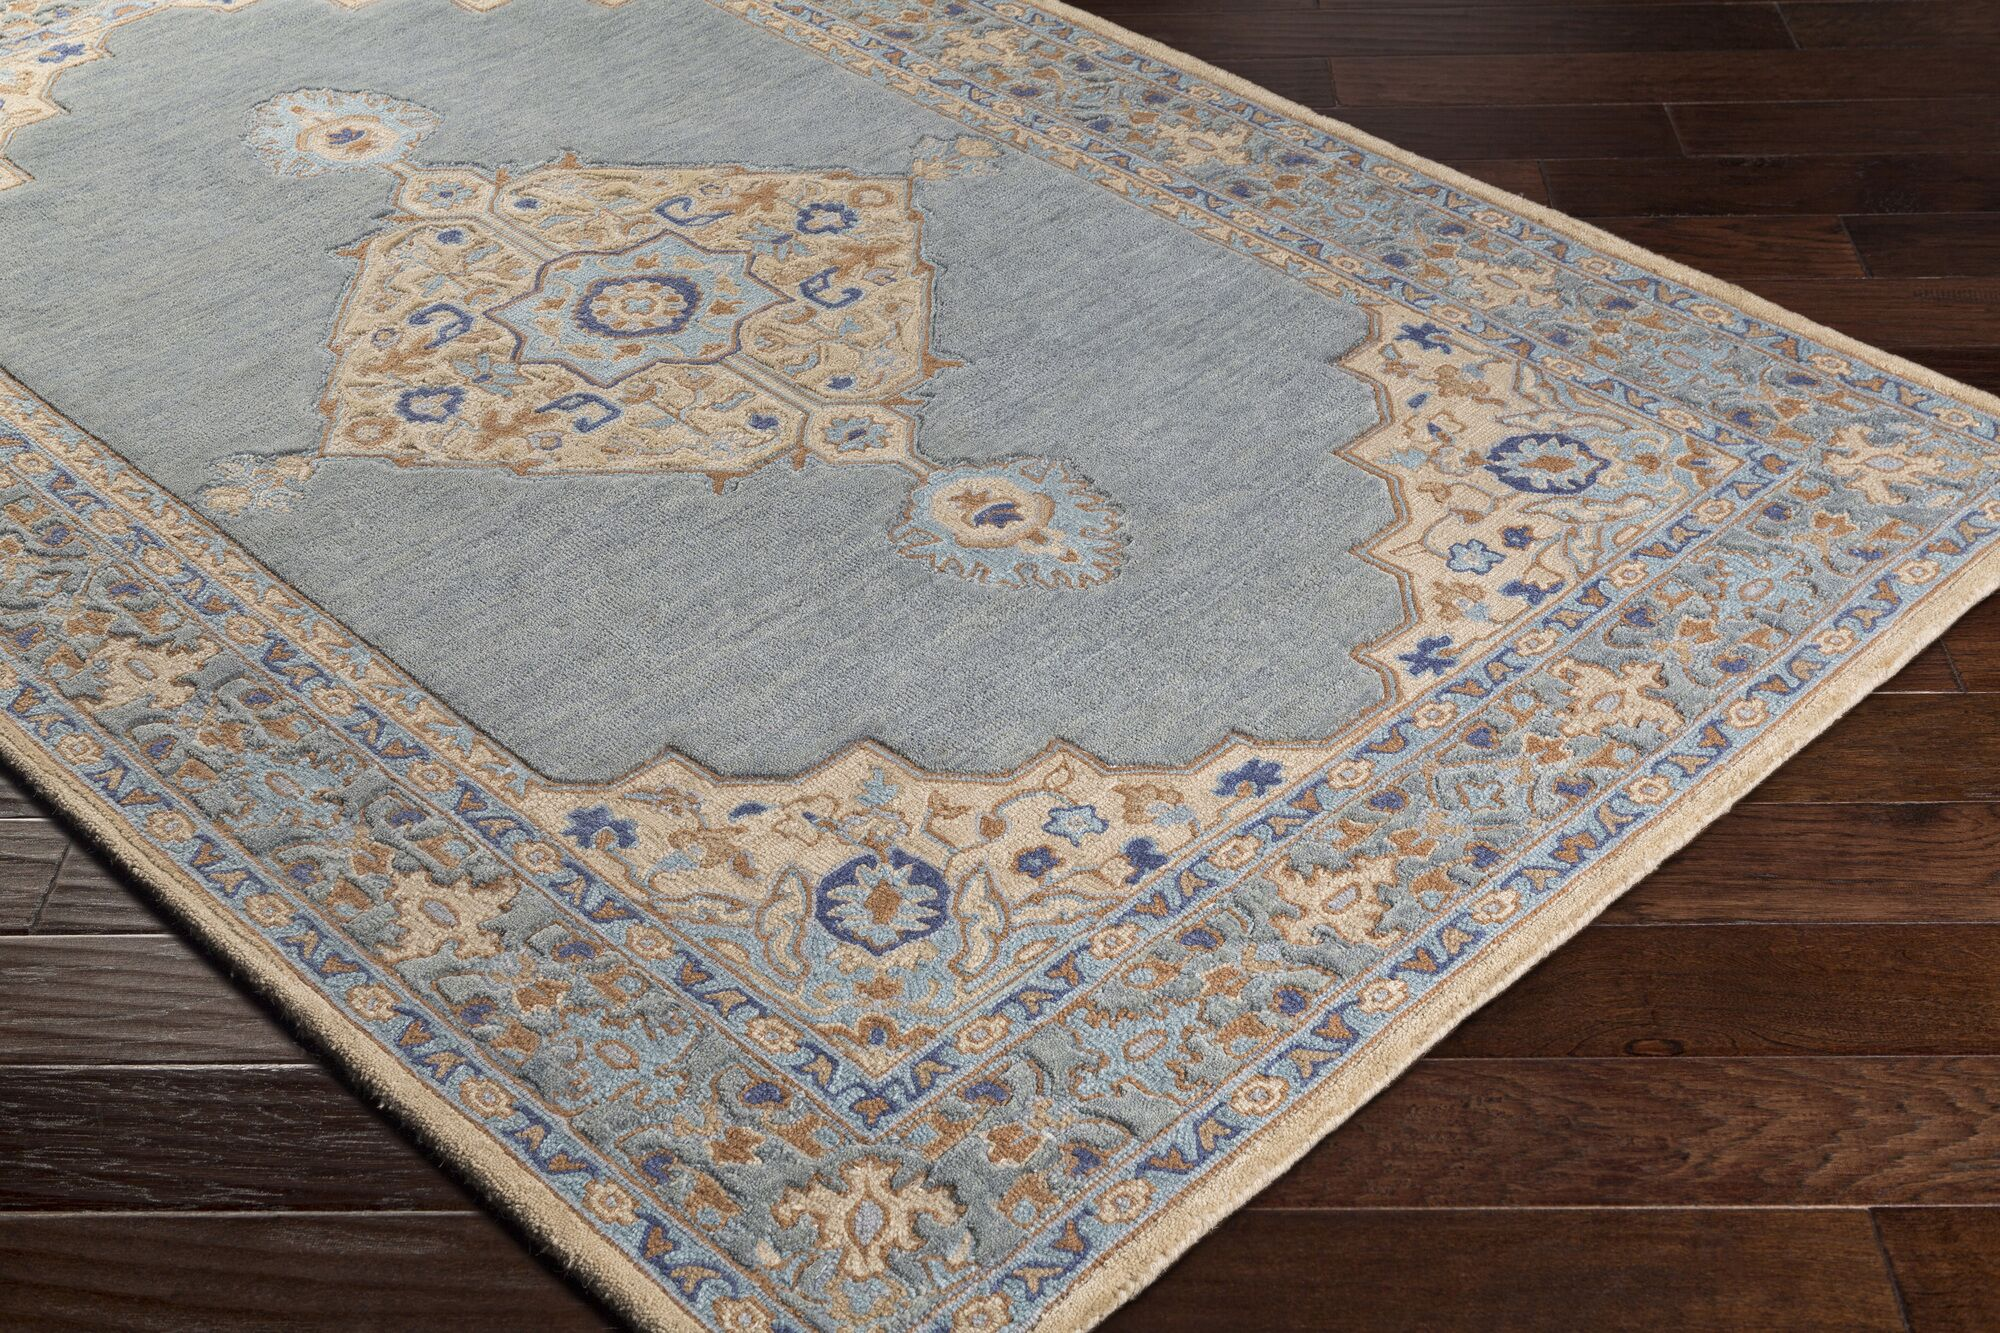 Edgerly Hand Tufted Wool Khak/Gray Area Rug Rug Size: Rectangle 8' x 10'